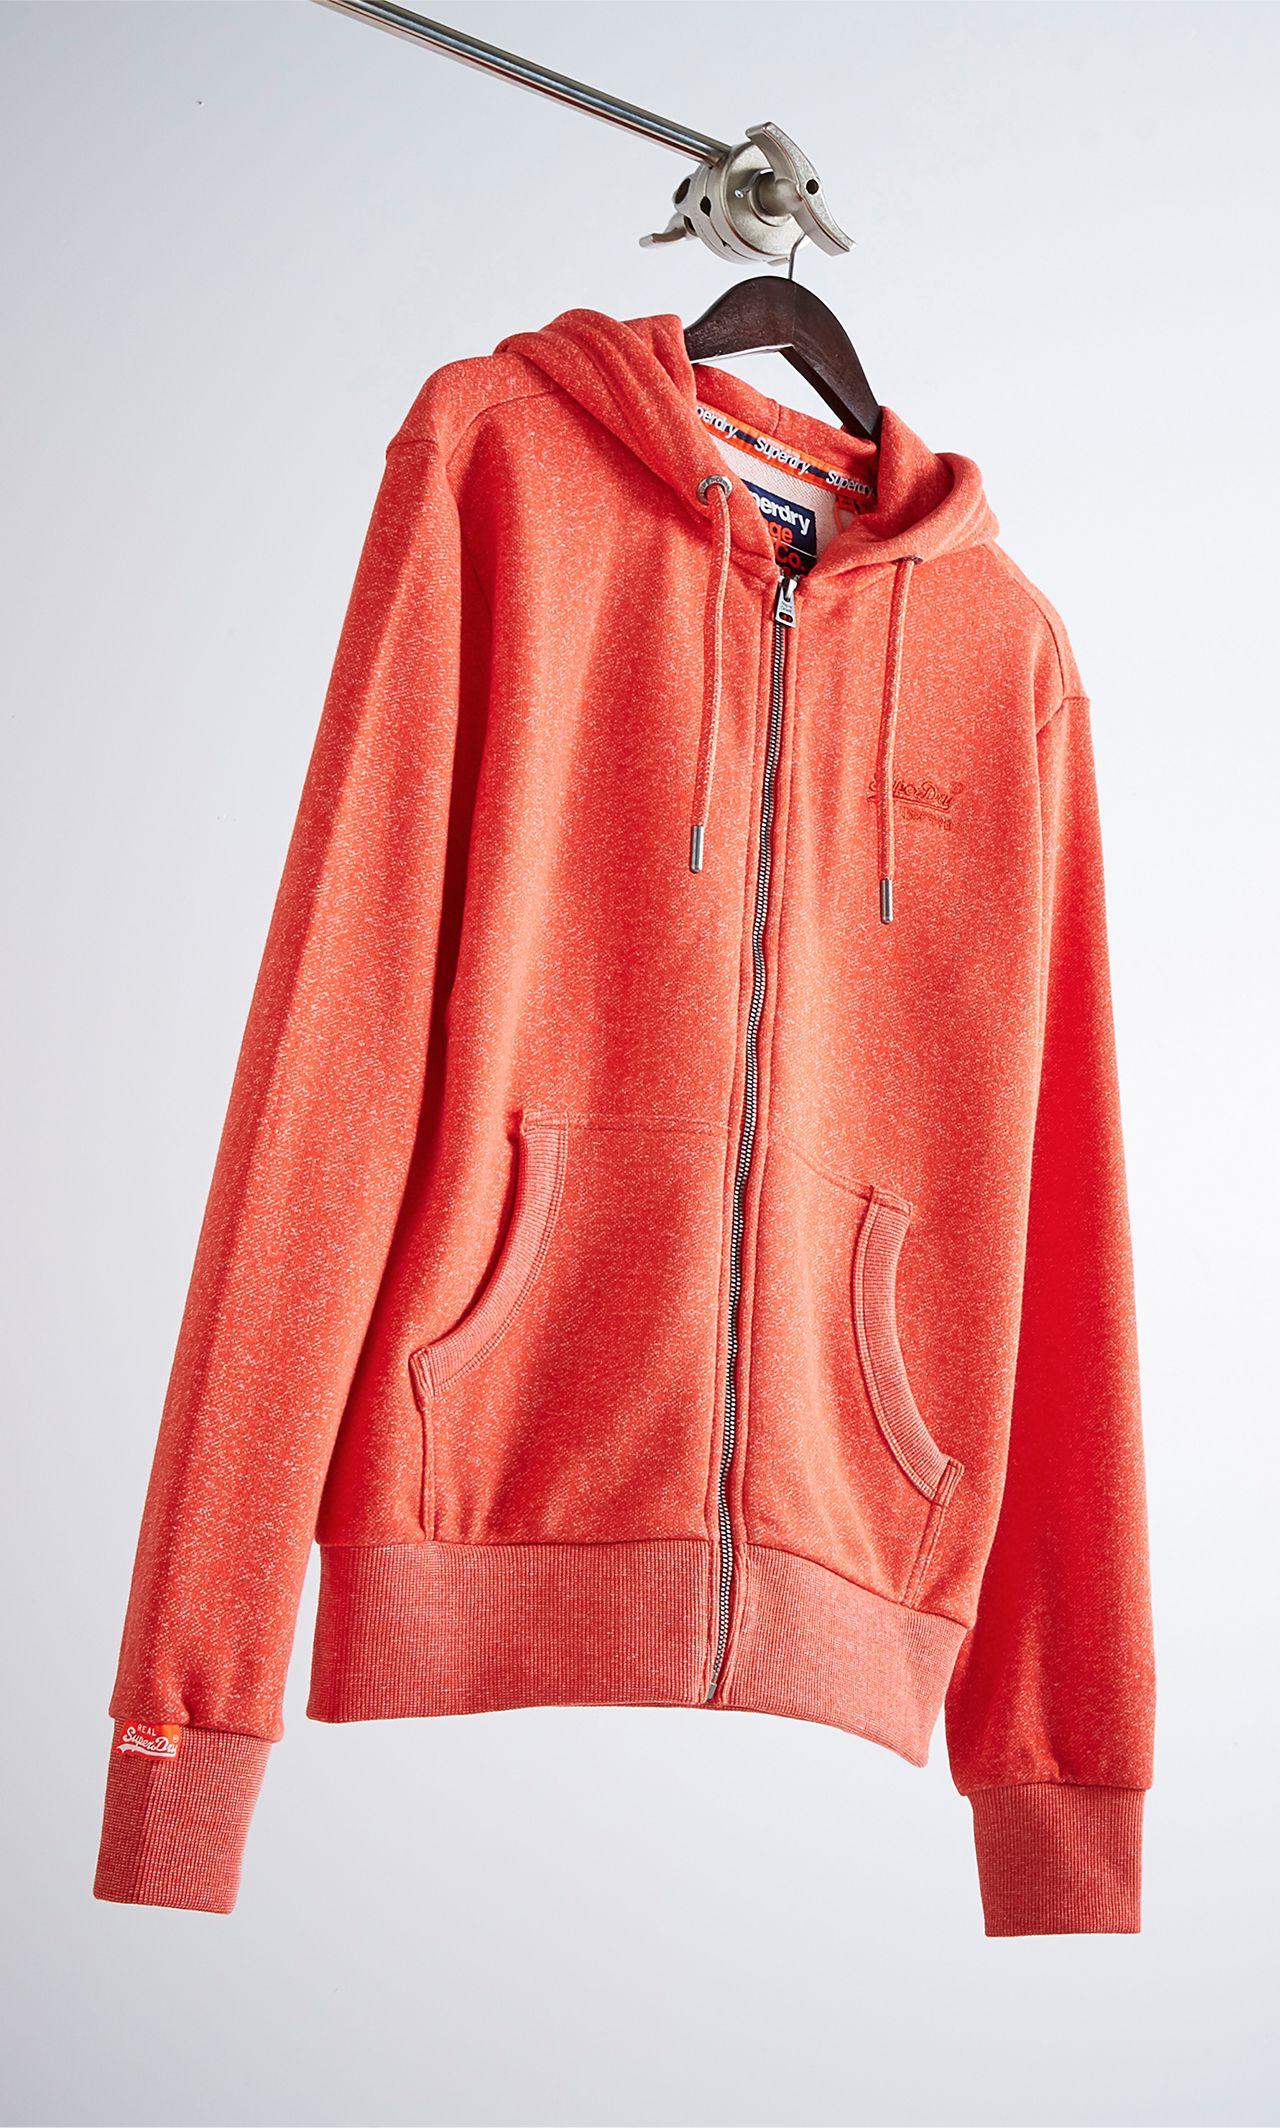 Shop Hoodies & Jackets